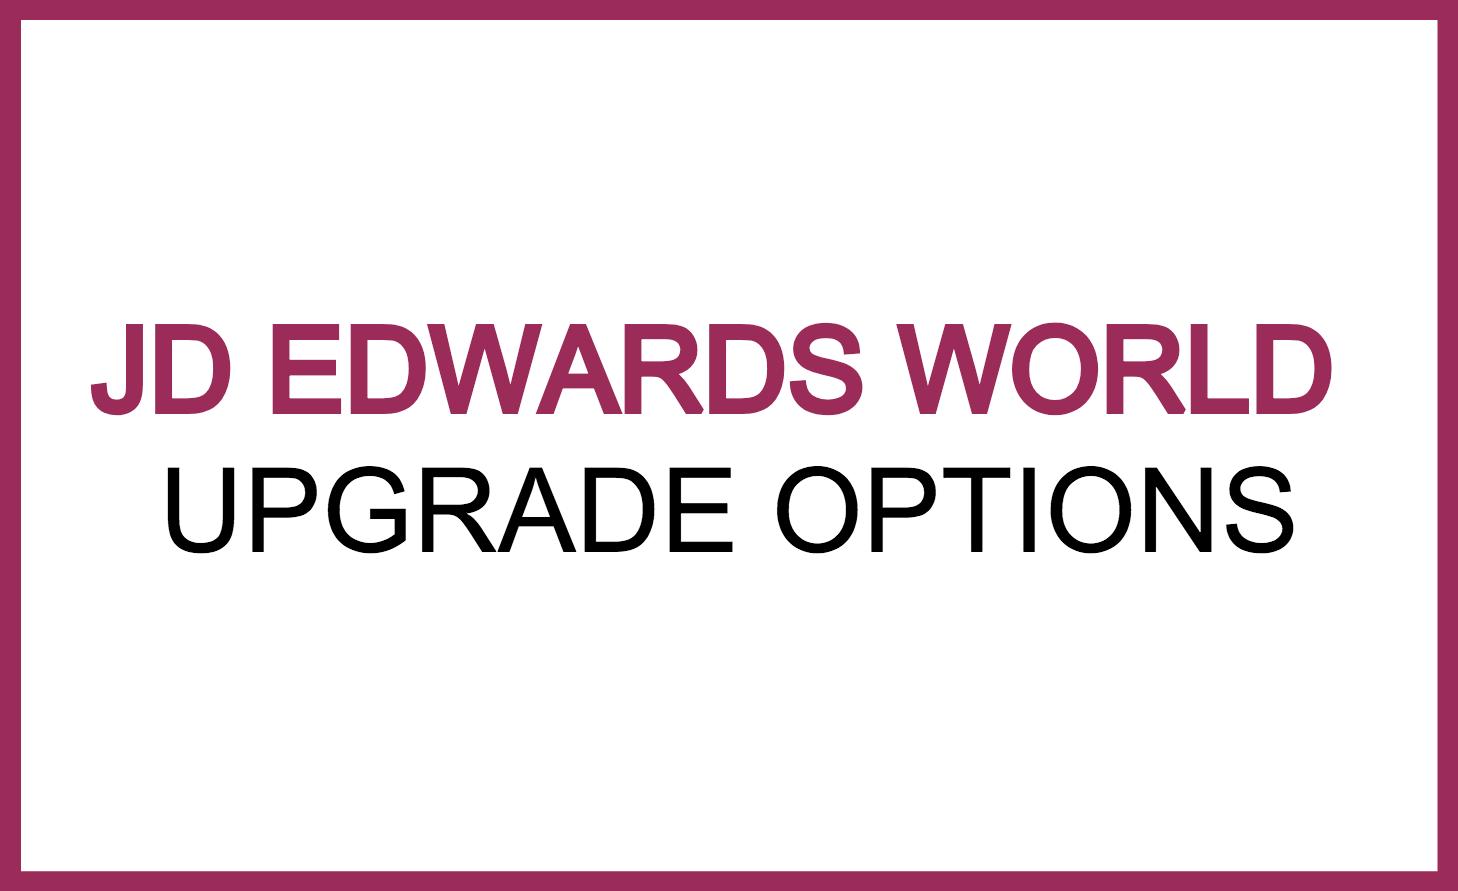 jde world upgrade options